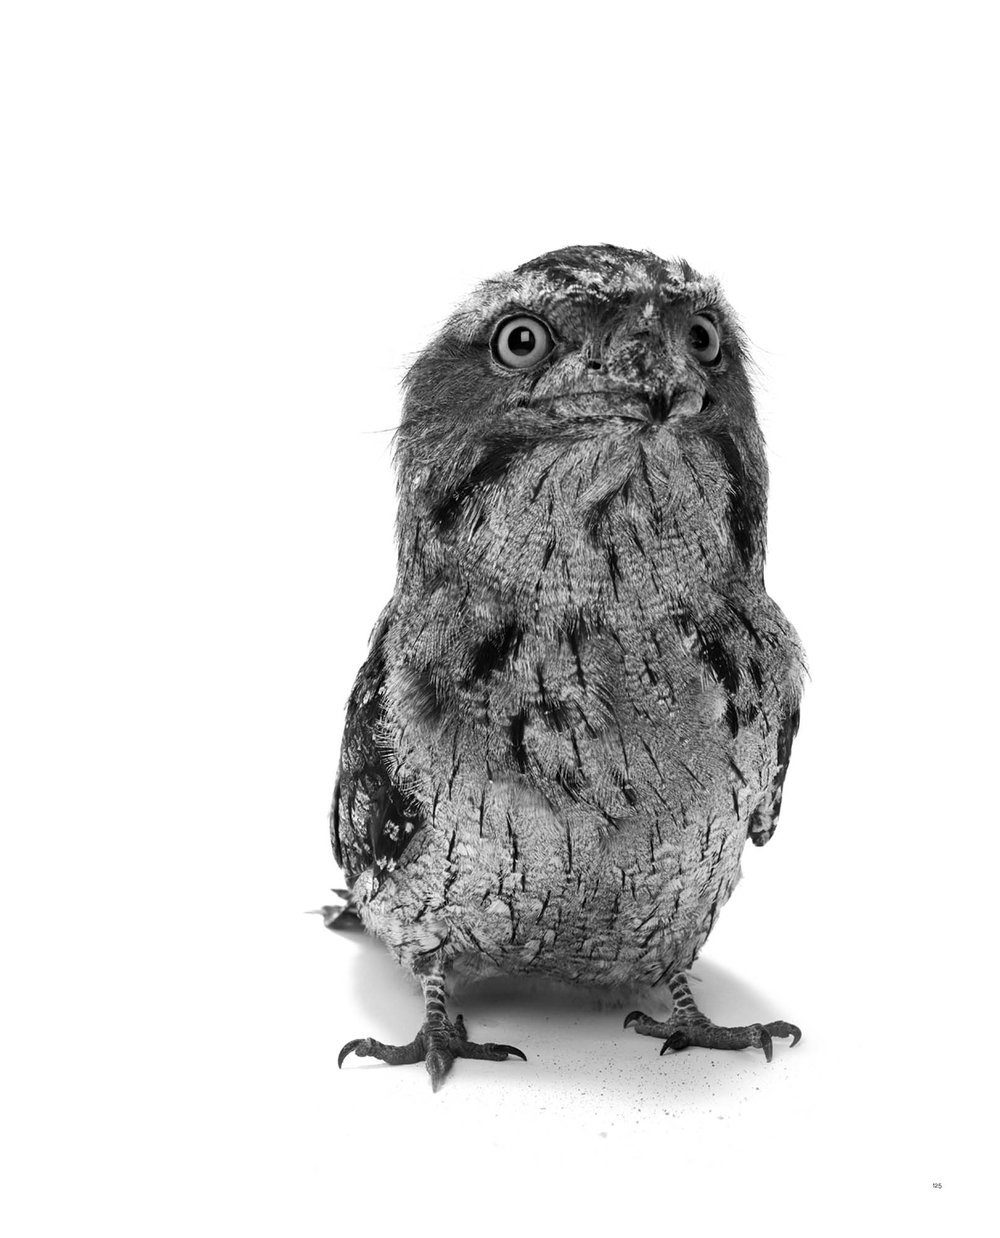 BIRD Gary Heery Book-completemmockup-127.jpg